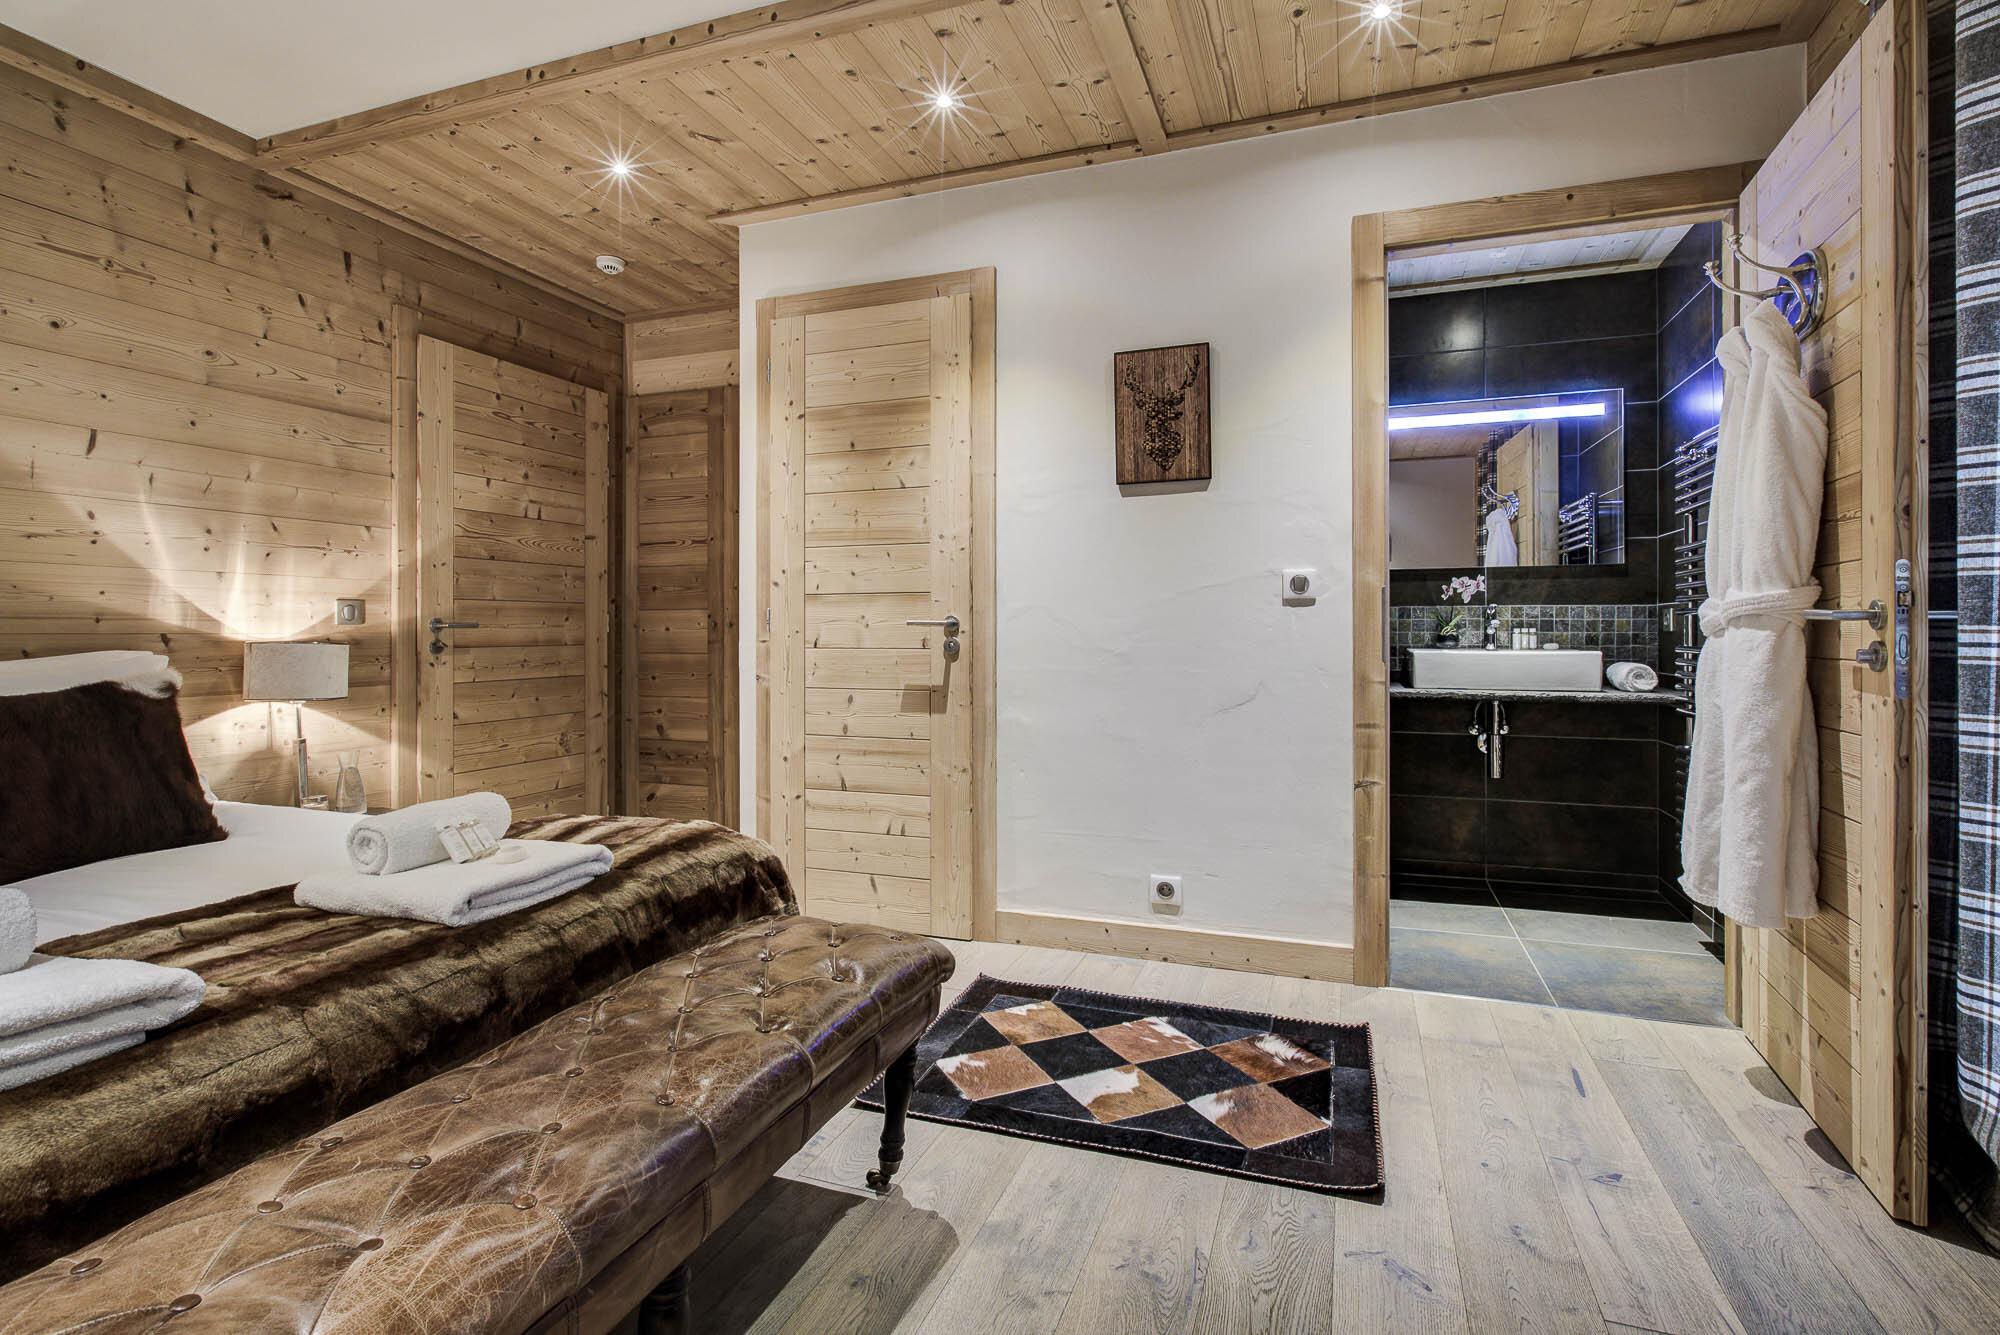 tg-ski-luxury-chalet-les-pierrys-morzine-013.jpg